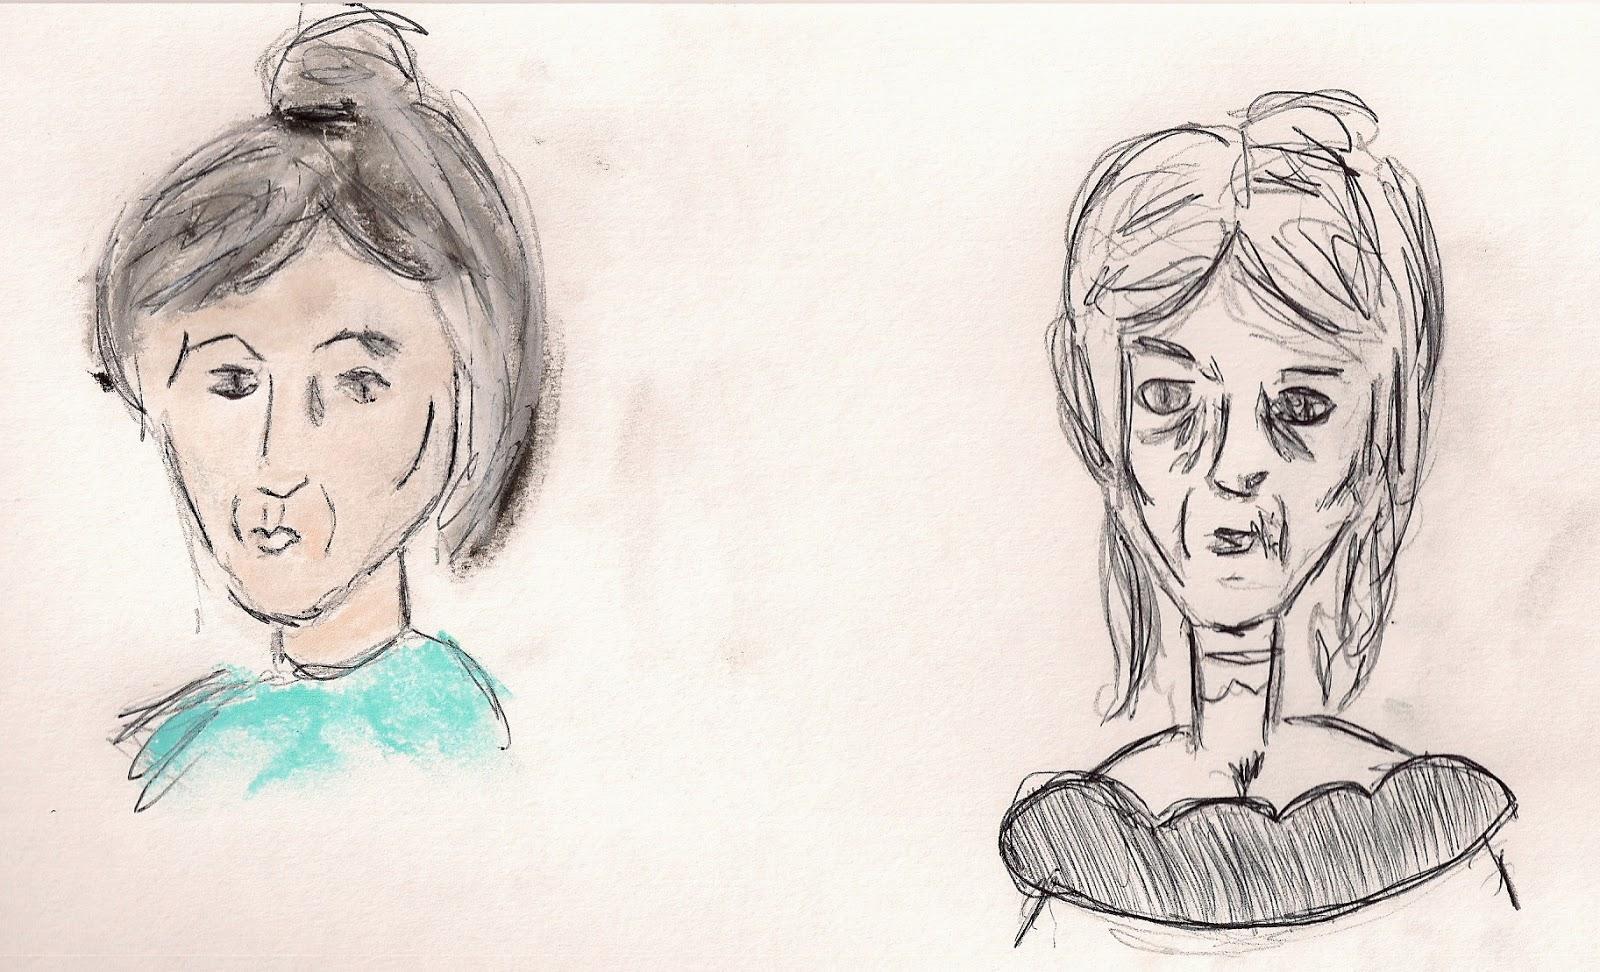 MeghannElizabeth: Who is Miss Havisham?